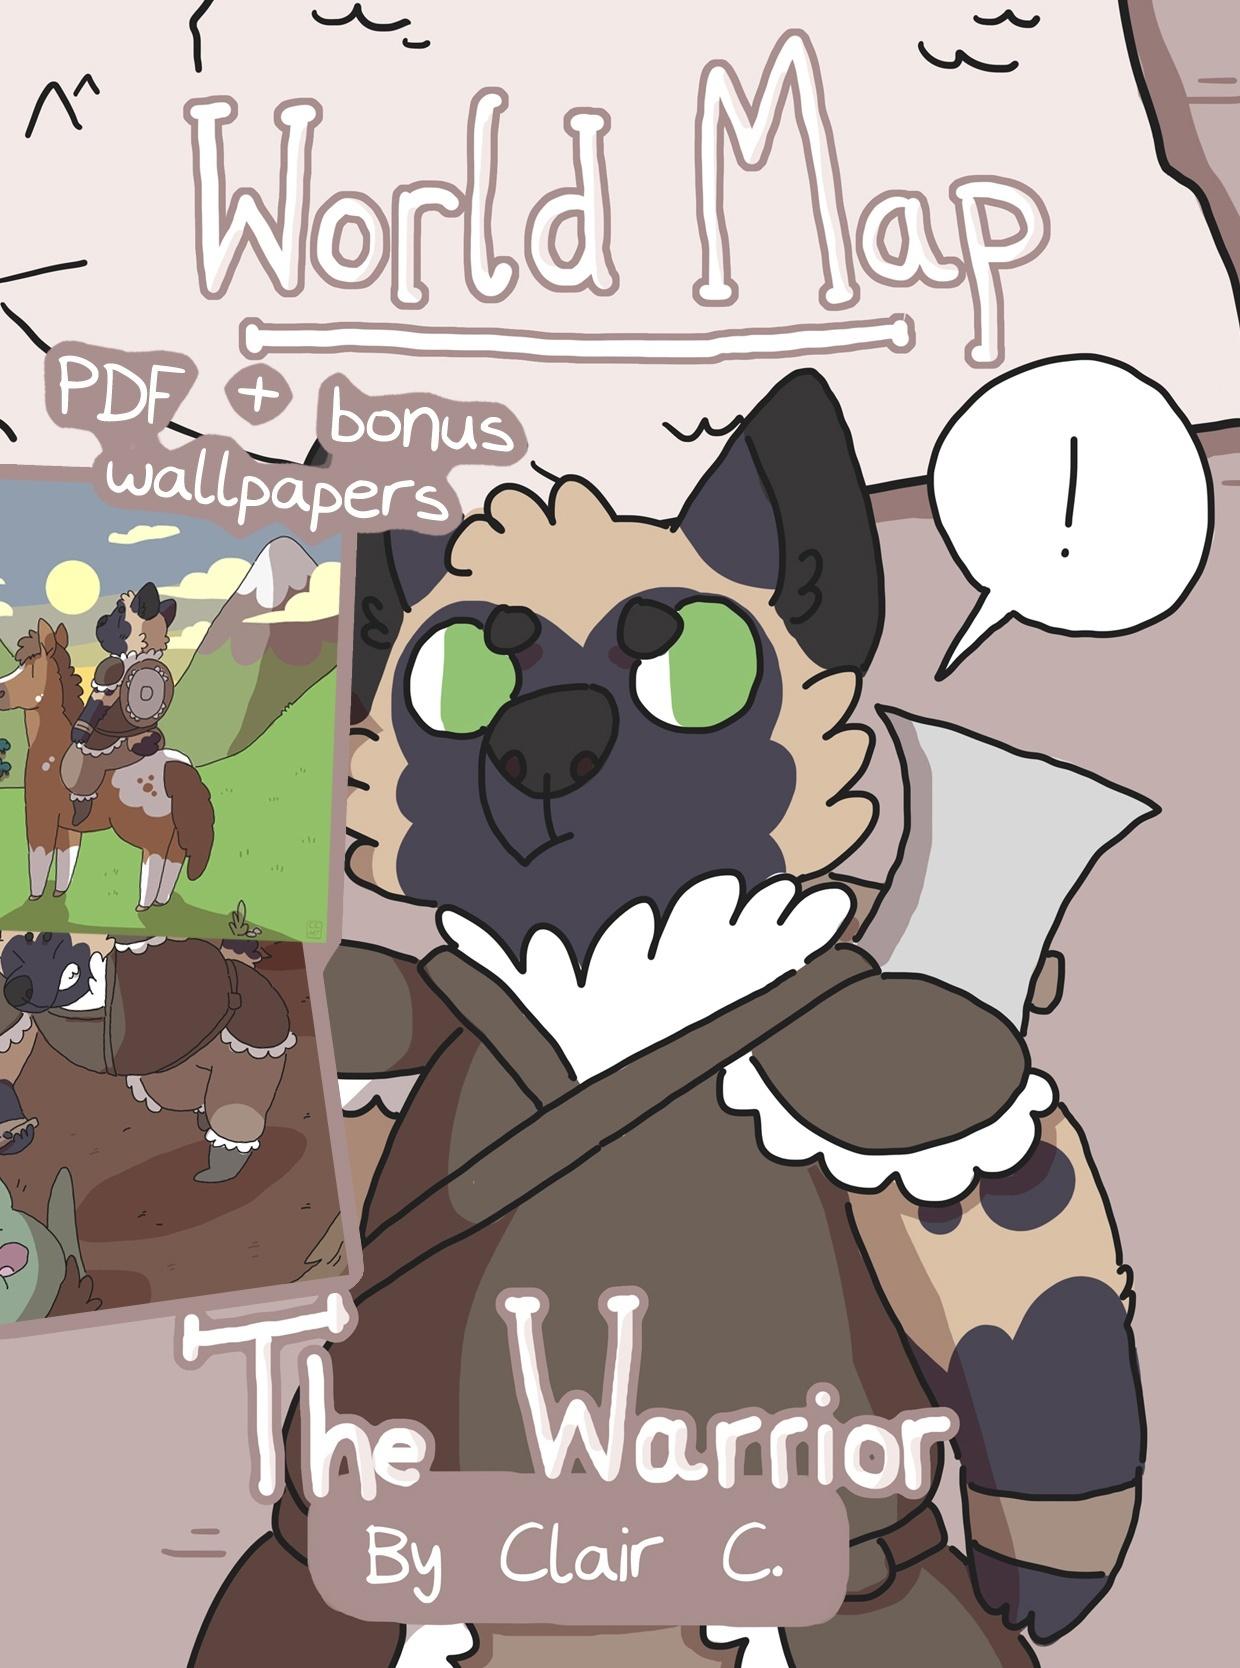 World Map: The Warrior PDF & Wallpaper Bundle